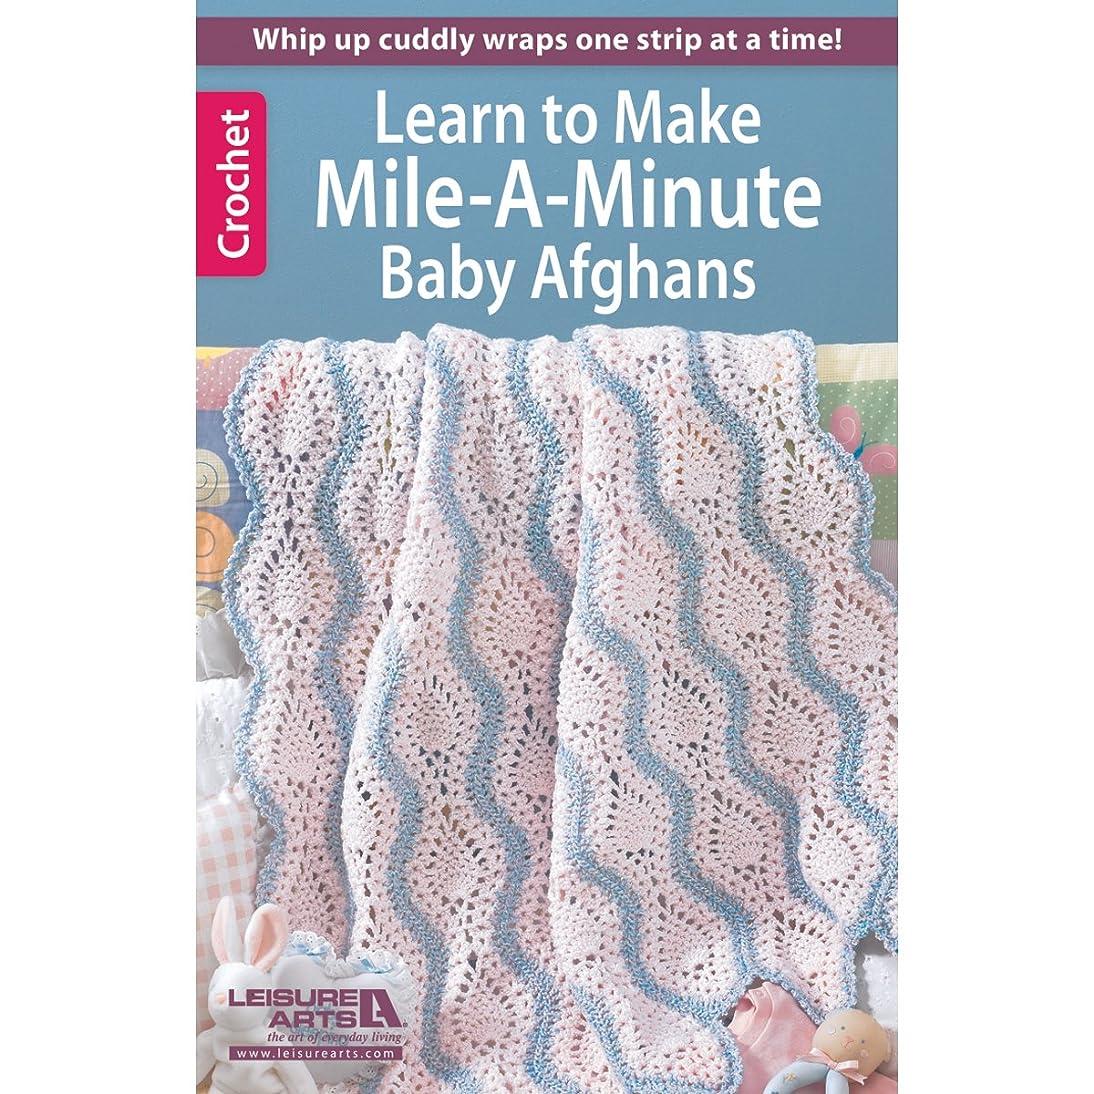 LEISURE ARTS LA-75473 Crochet Mile a Minute Baby Afghans Book